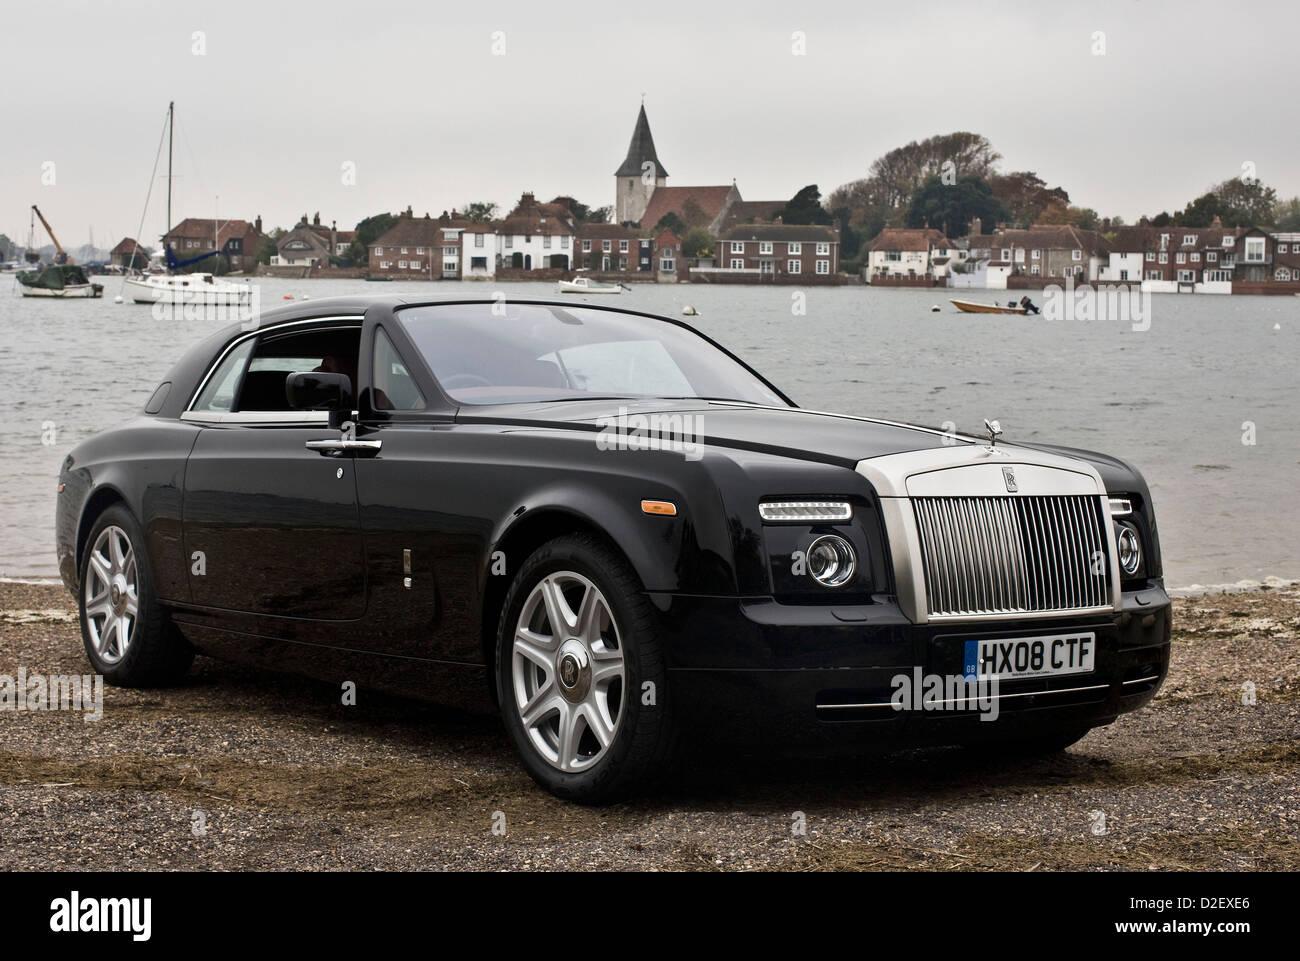 British Luxury Car Stock Photos Amp British Luxury Car Stock Images Alamy